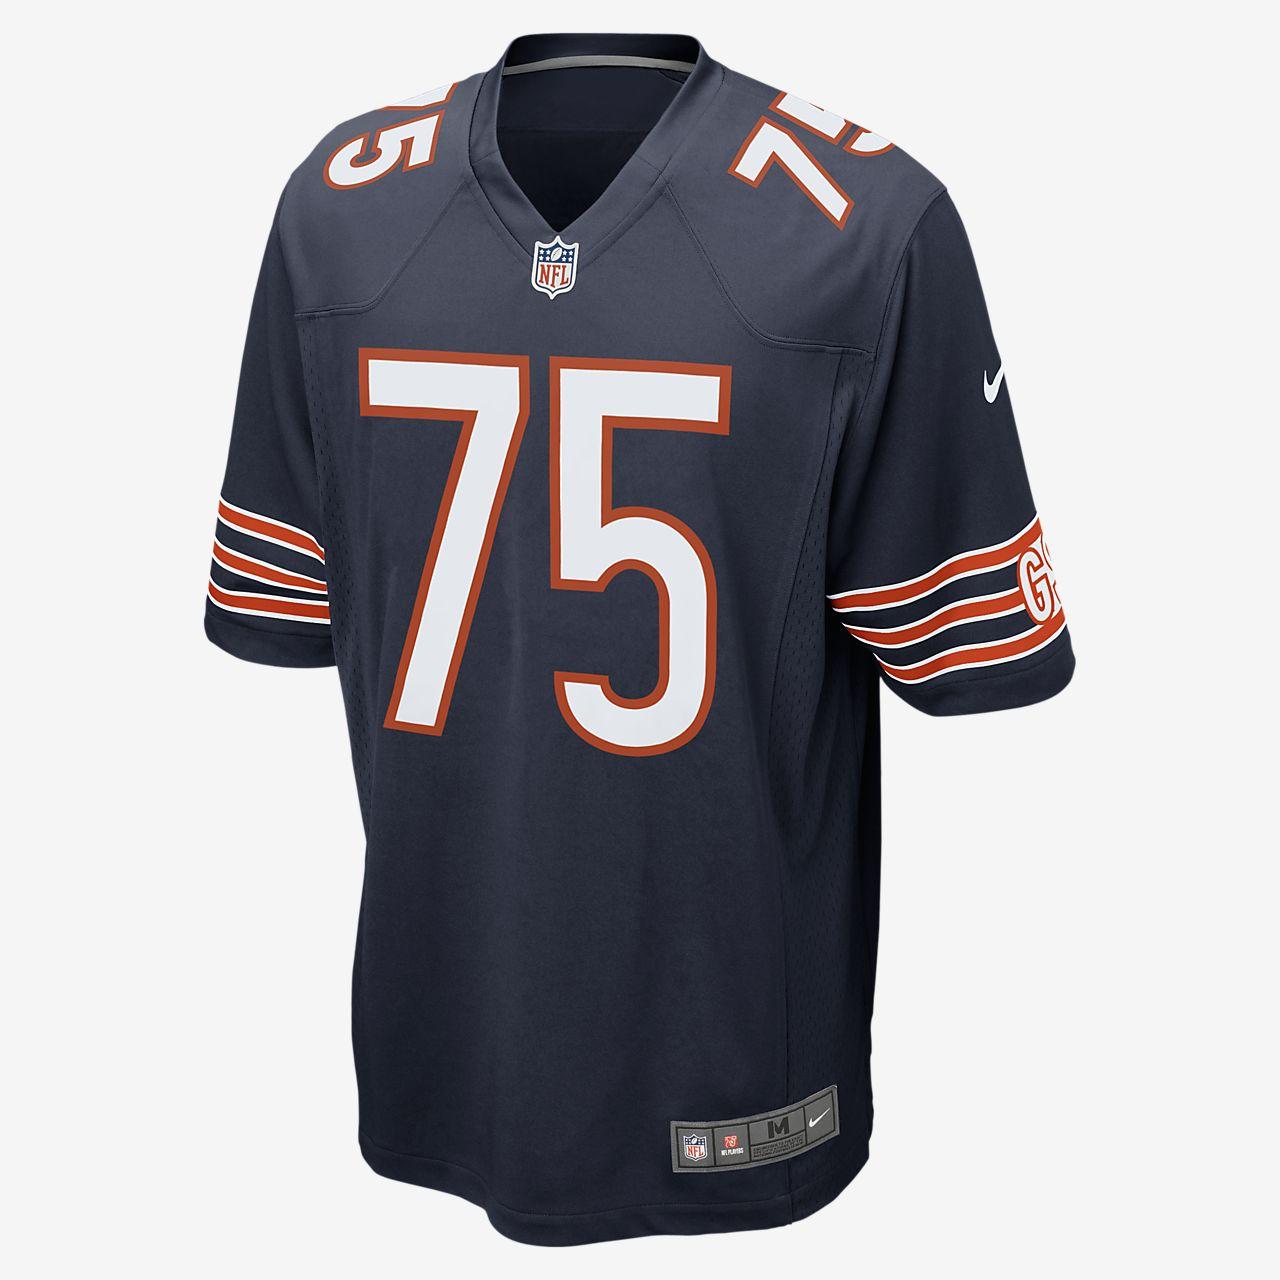 Camiseta de fútbol americano para hombre NFL Chicago Bears Game (Kyle Long) b049c372377